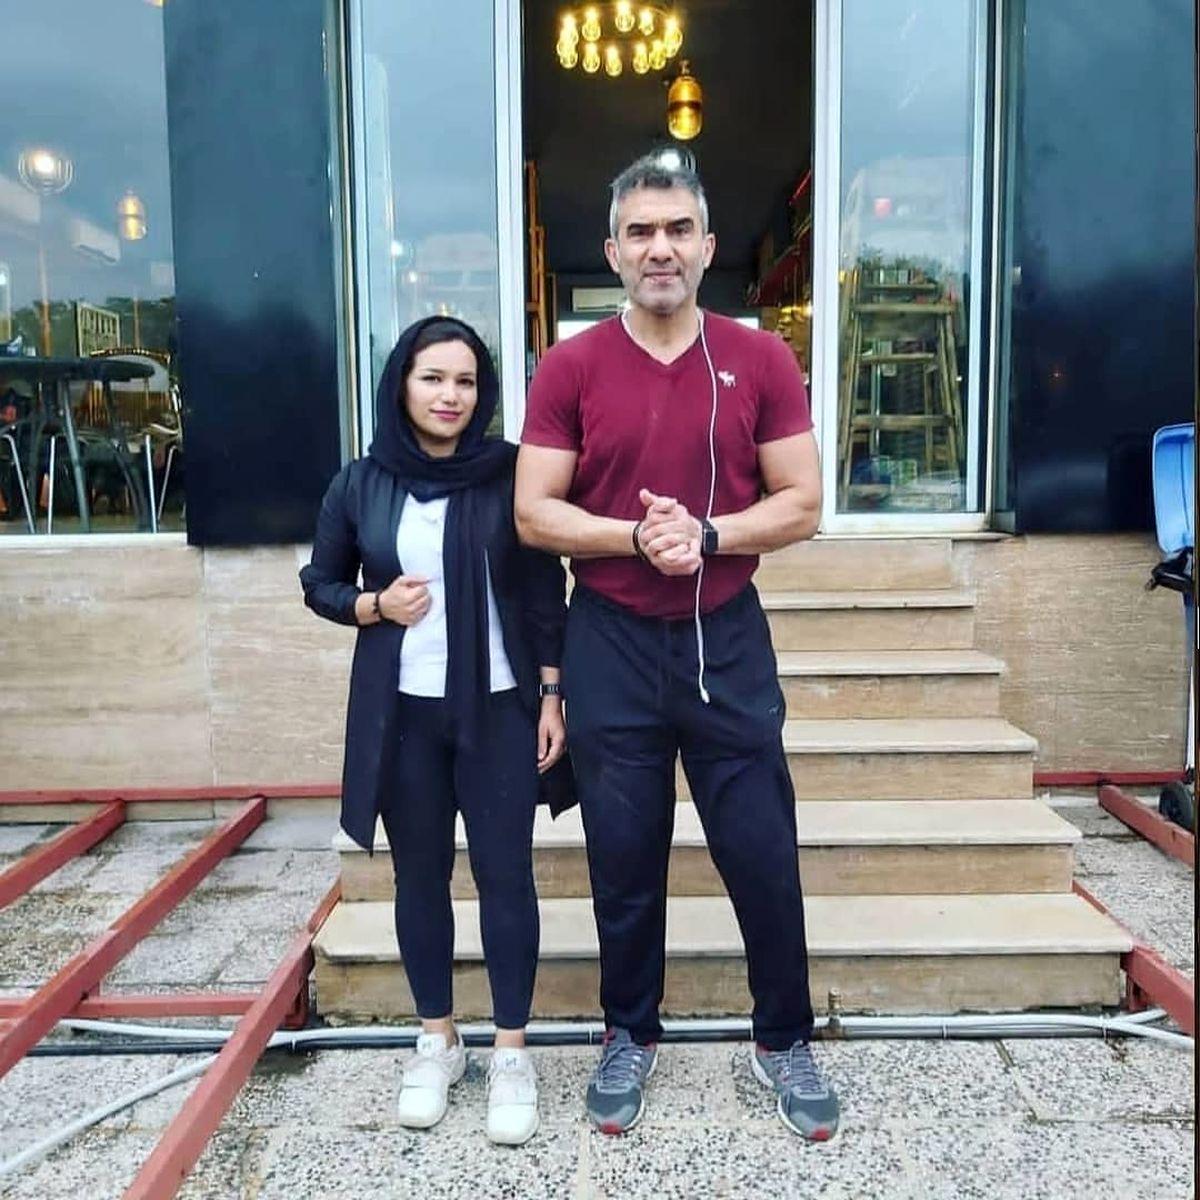 رستوران شیک و لاکچری احمدرضا عابدزاده + عکس